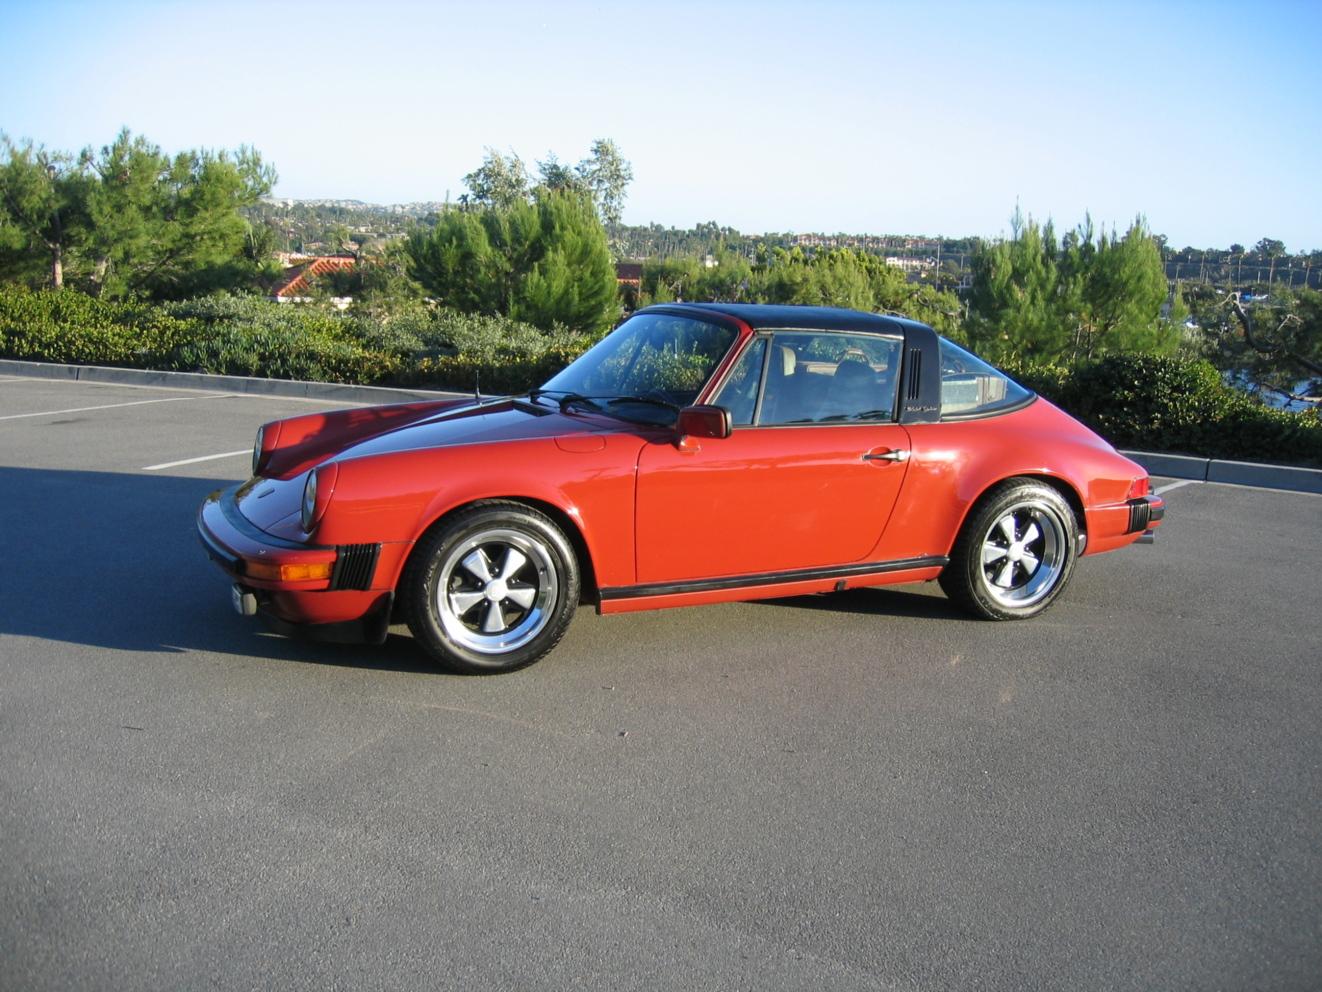 82 Litre V 8 Porsche 911 Targa Msd Tach Adapter Wiring Click On Photo Below For Enlargement